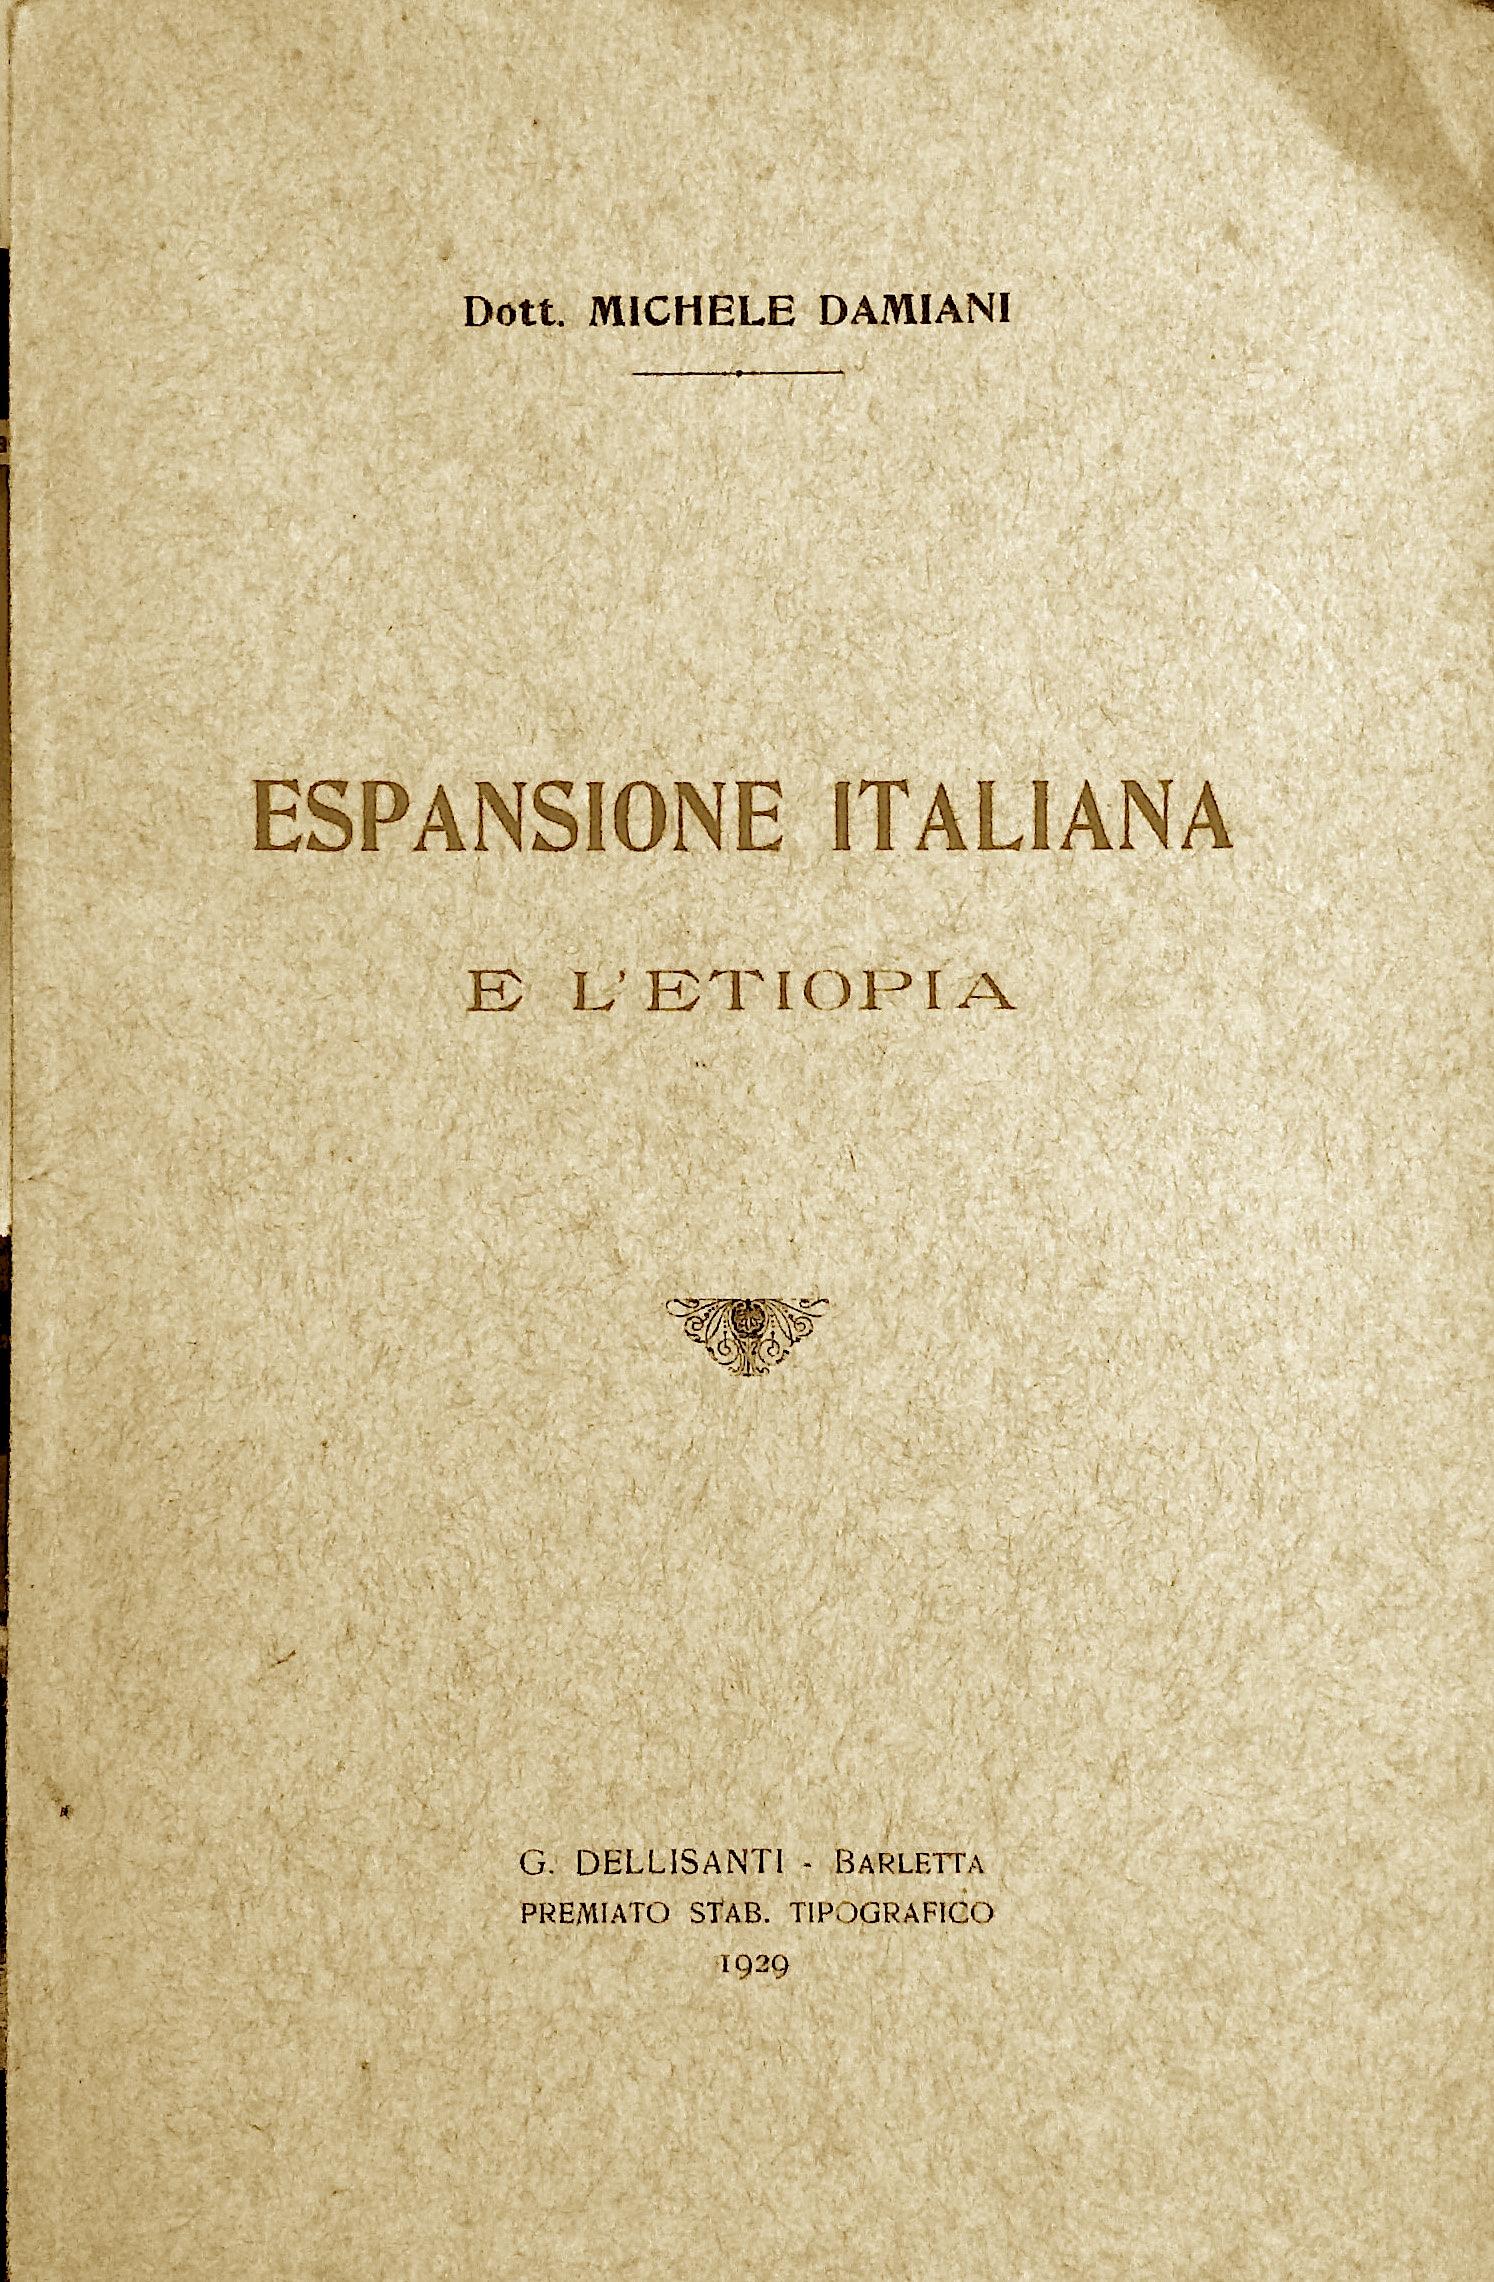 Espansione italiana e l'Etiopia